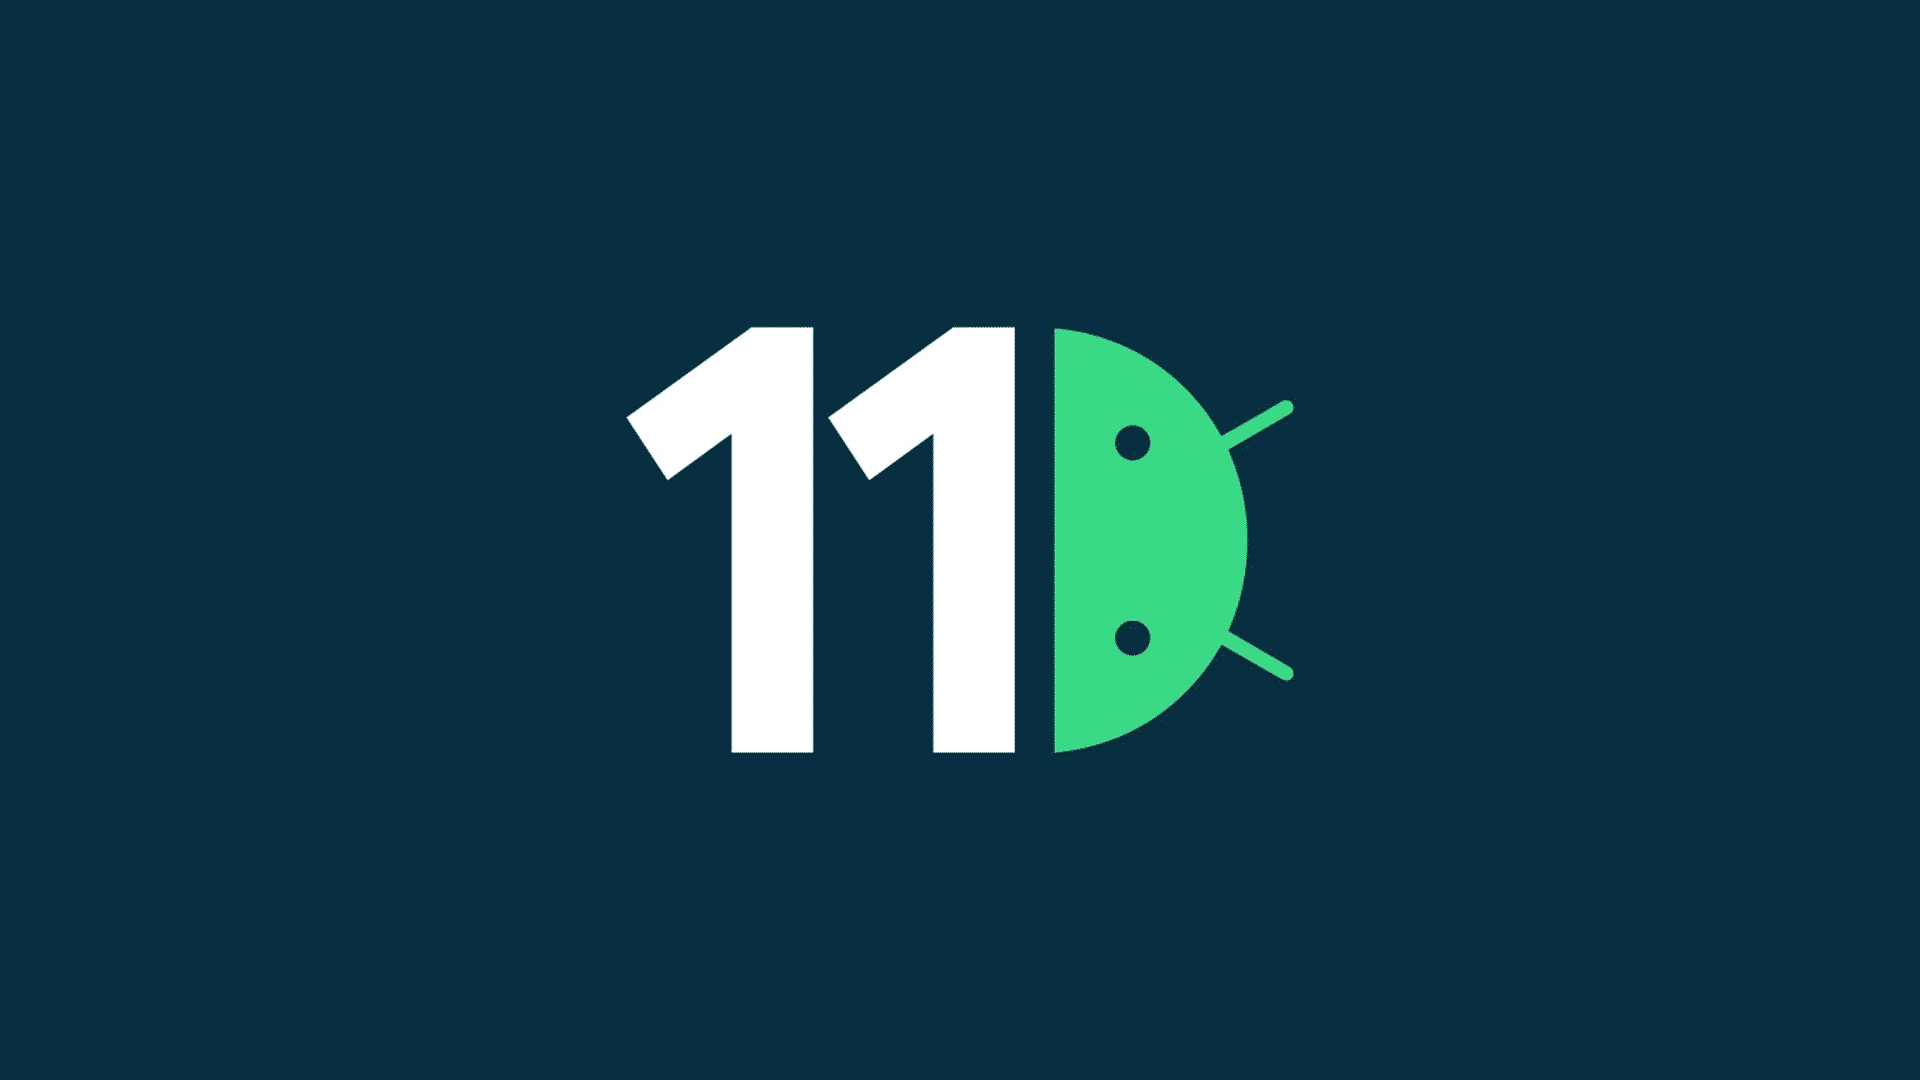 kedy vyjde novy android 11